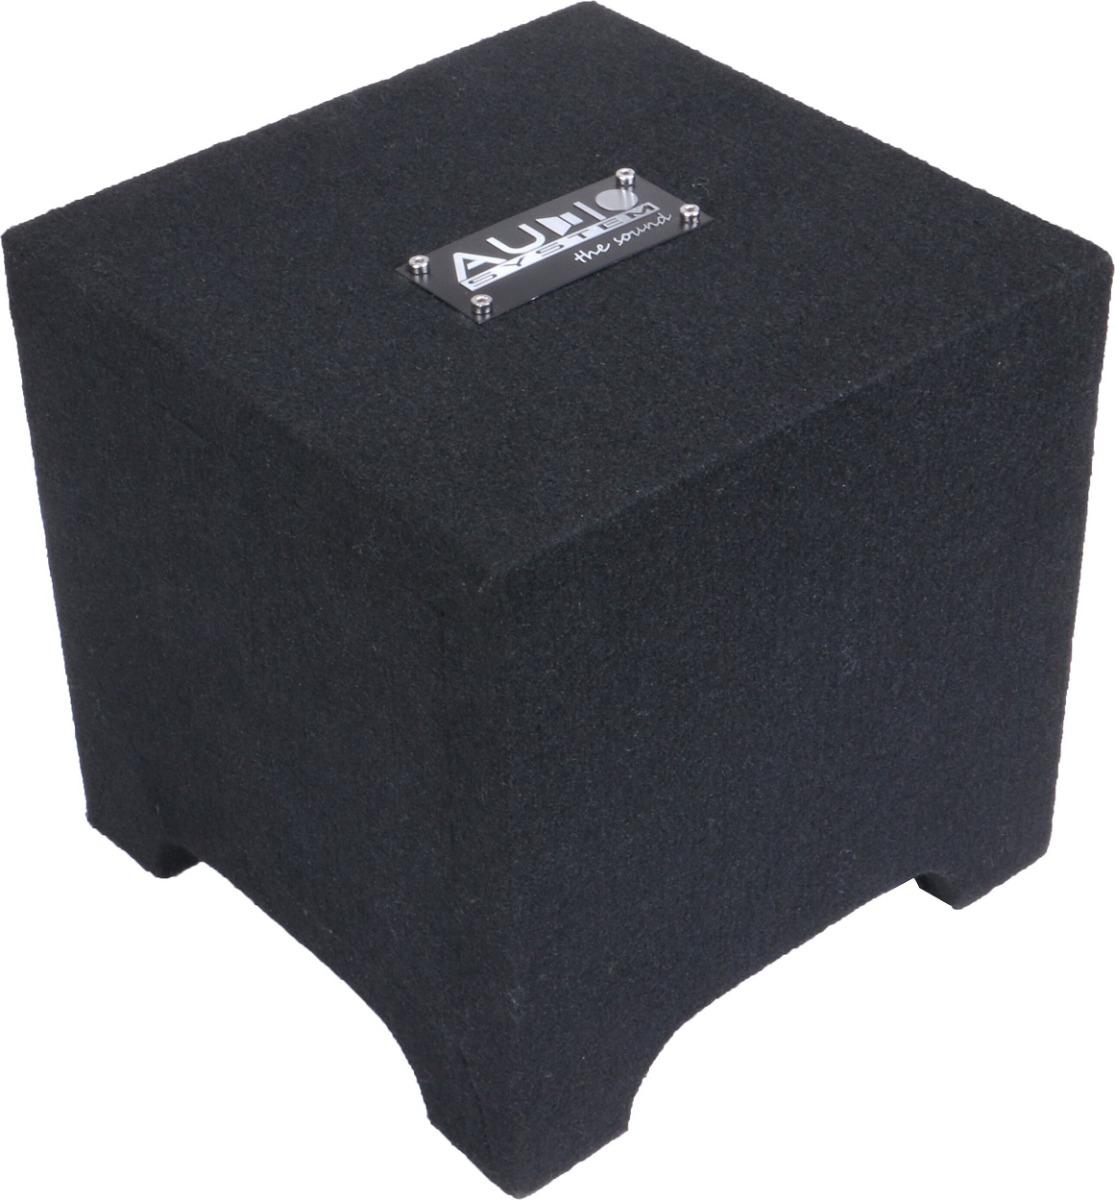 Audio System R 08 FLAT GDF1 ACTIVE DOWN FIRE Gehäuse Subwoofer + Monoamplifier R 08 FLAT + CO-200.1